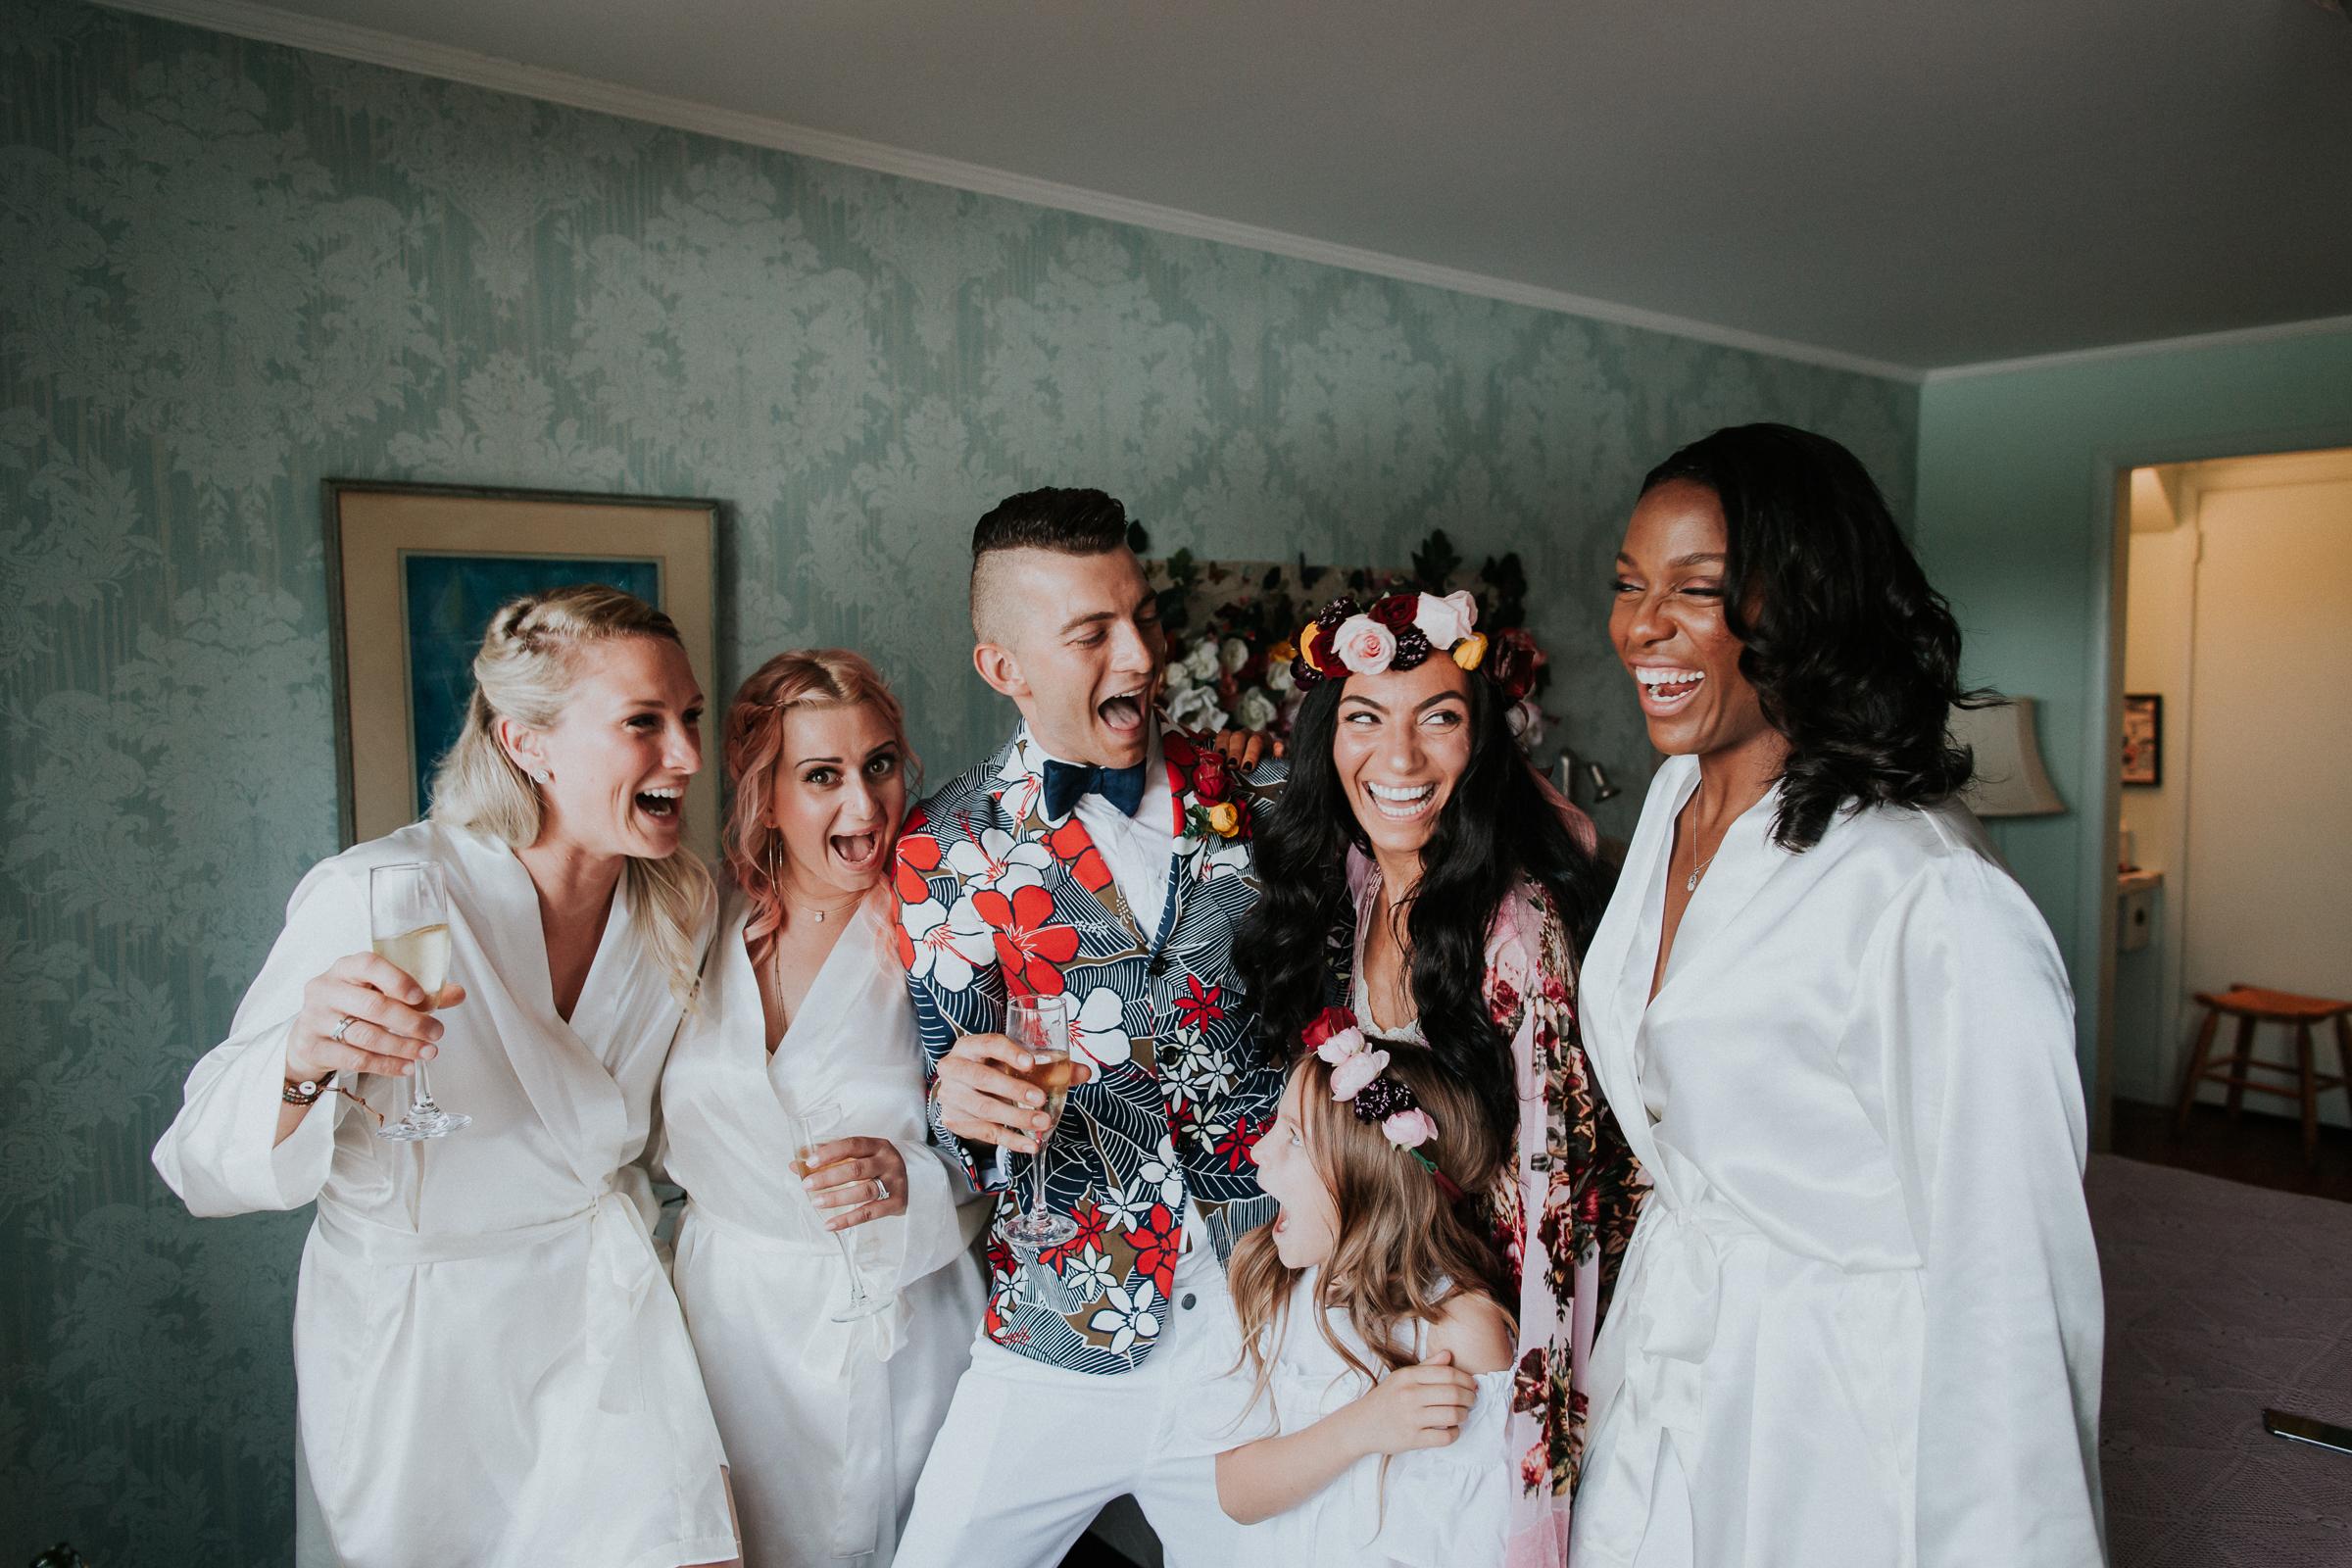 Backyard-Intimate-Adventurous-Destination-Wedding-Darien-Connecticut-Documentary-Wedding-Photography-18.jpg